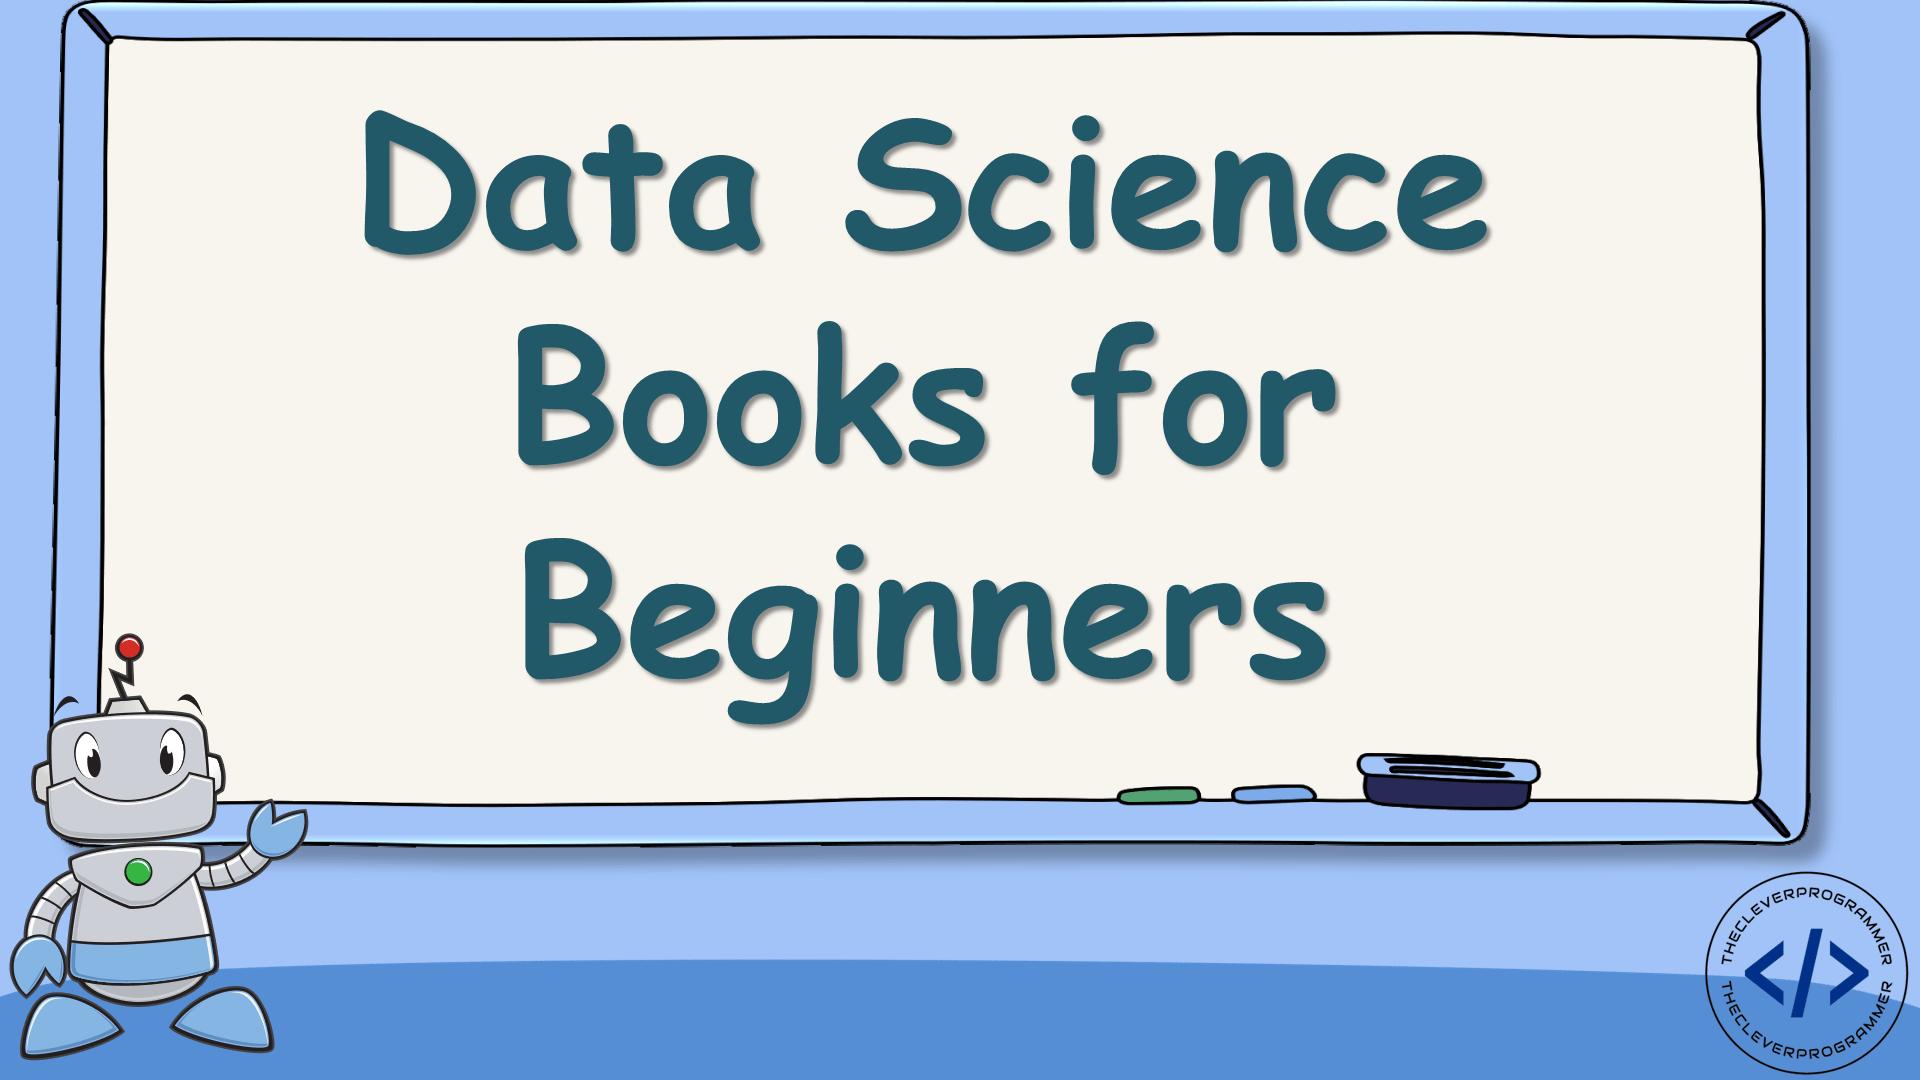 Data Science Books for Beginners